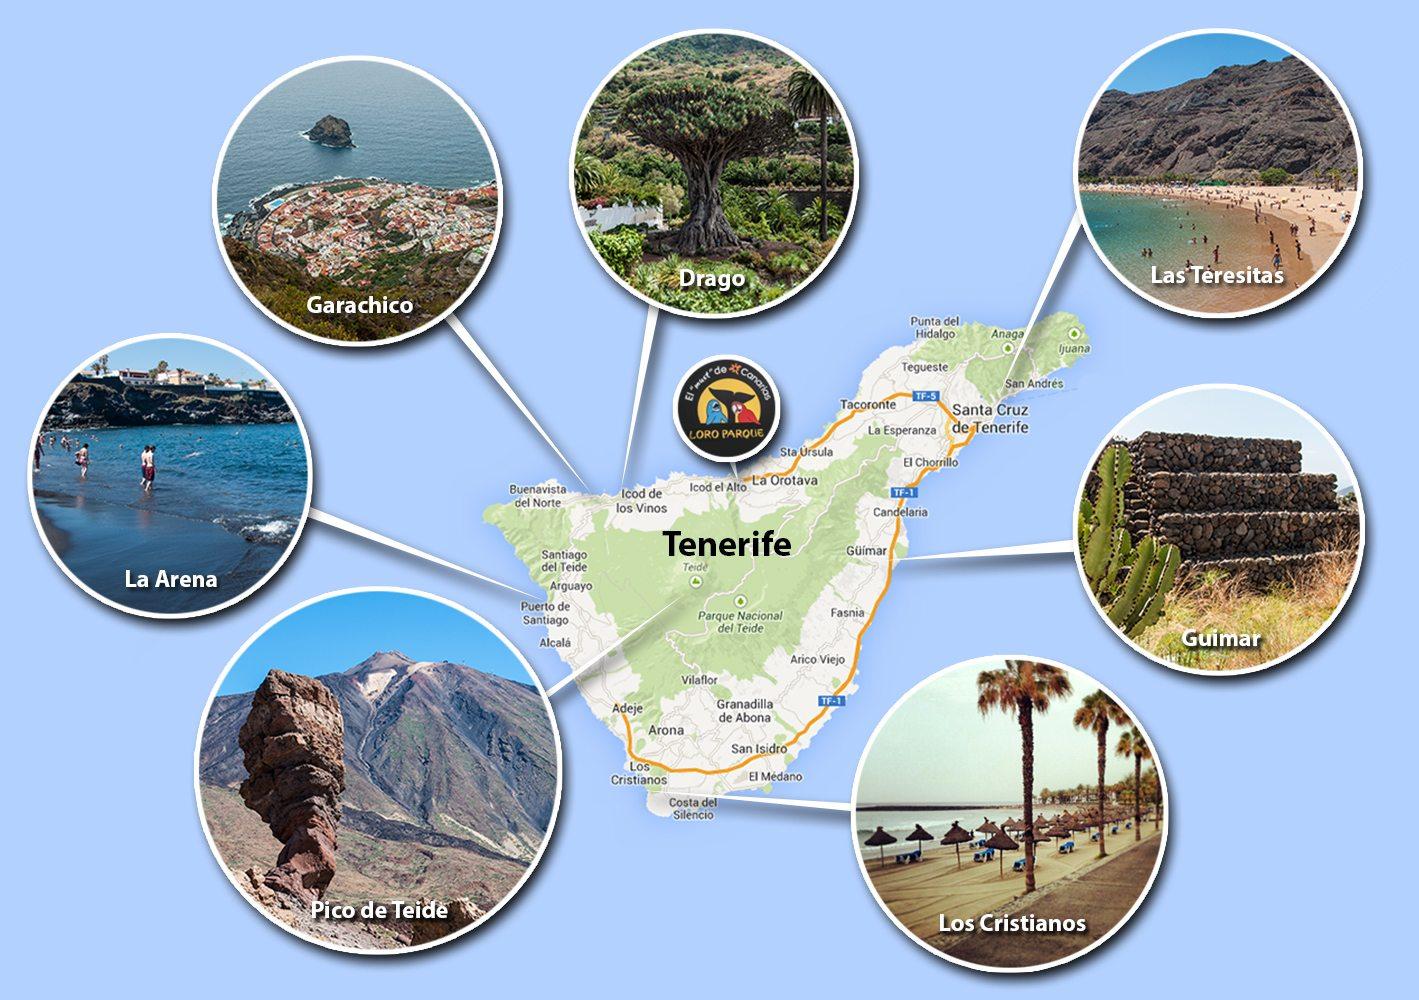 Mapa Tenerife Places Stay Canary Islands